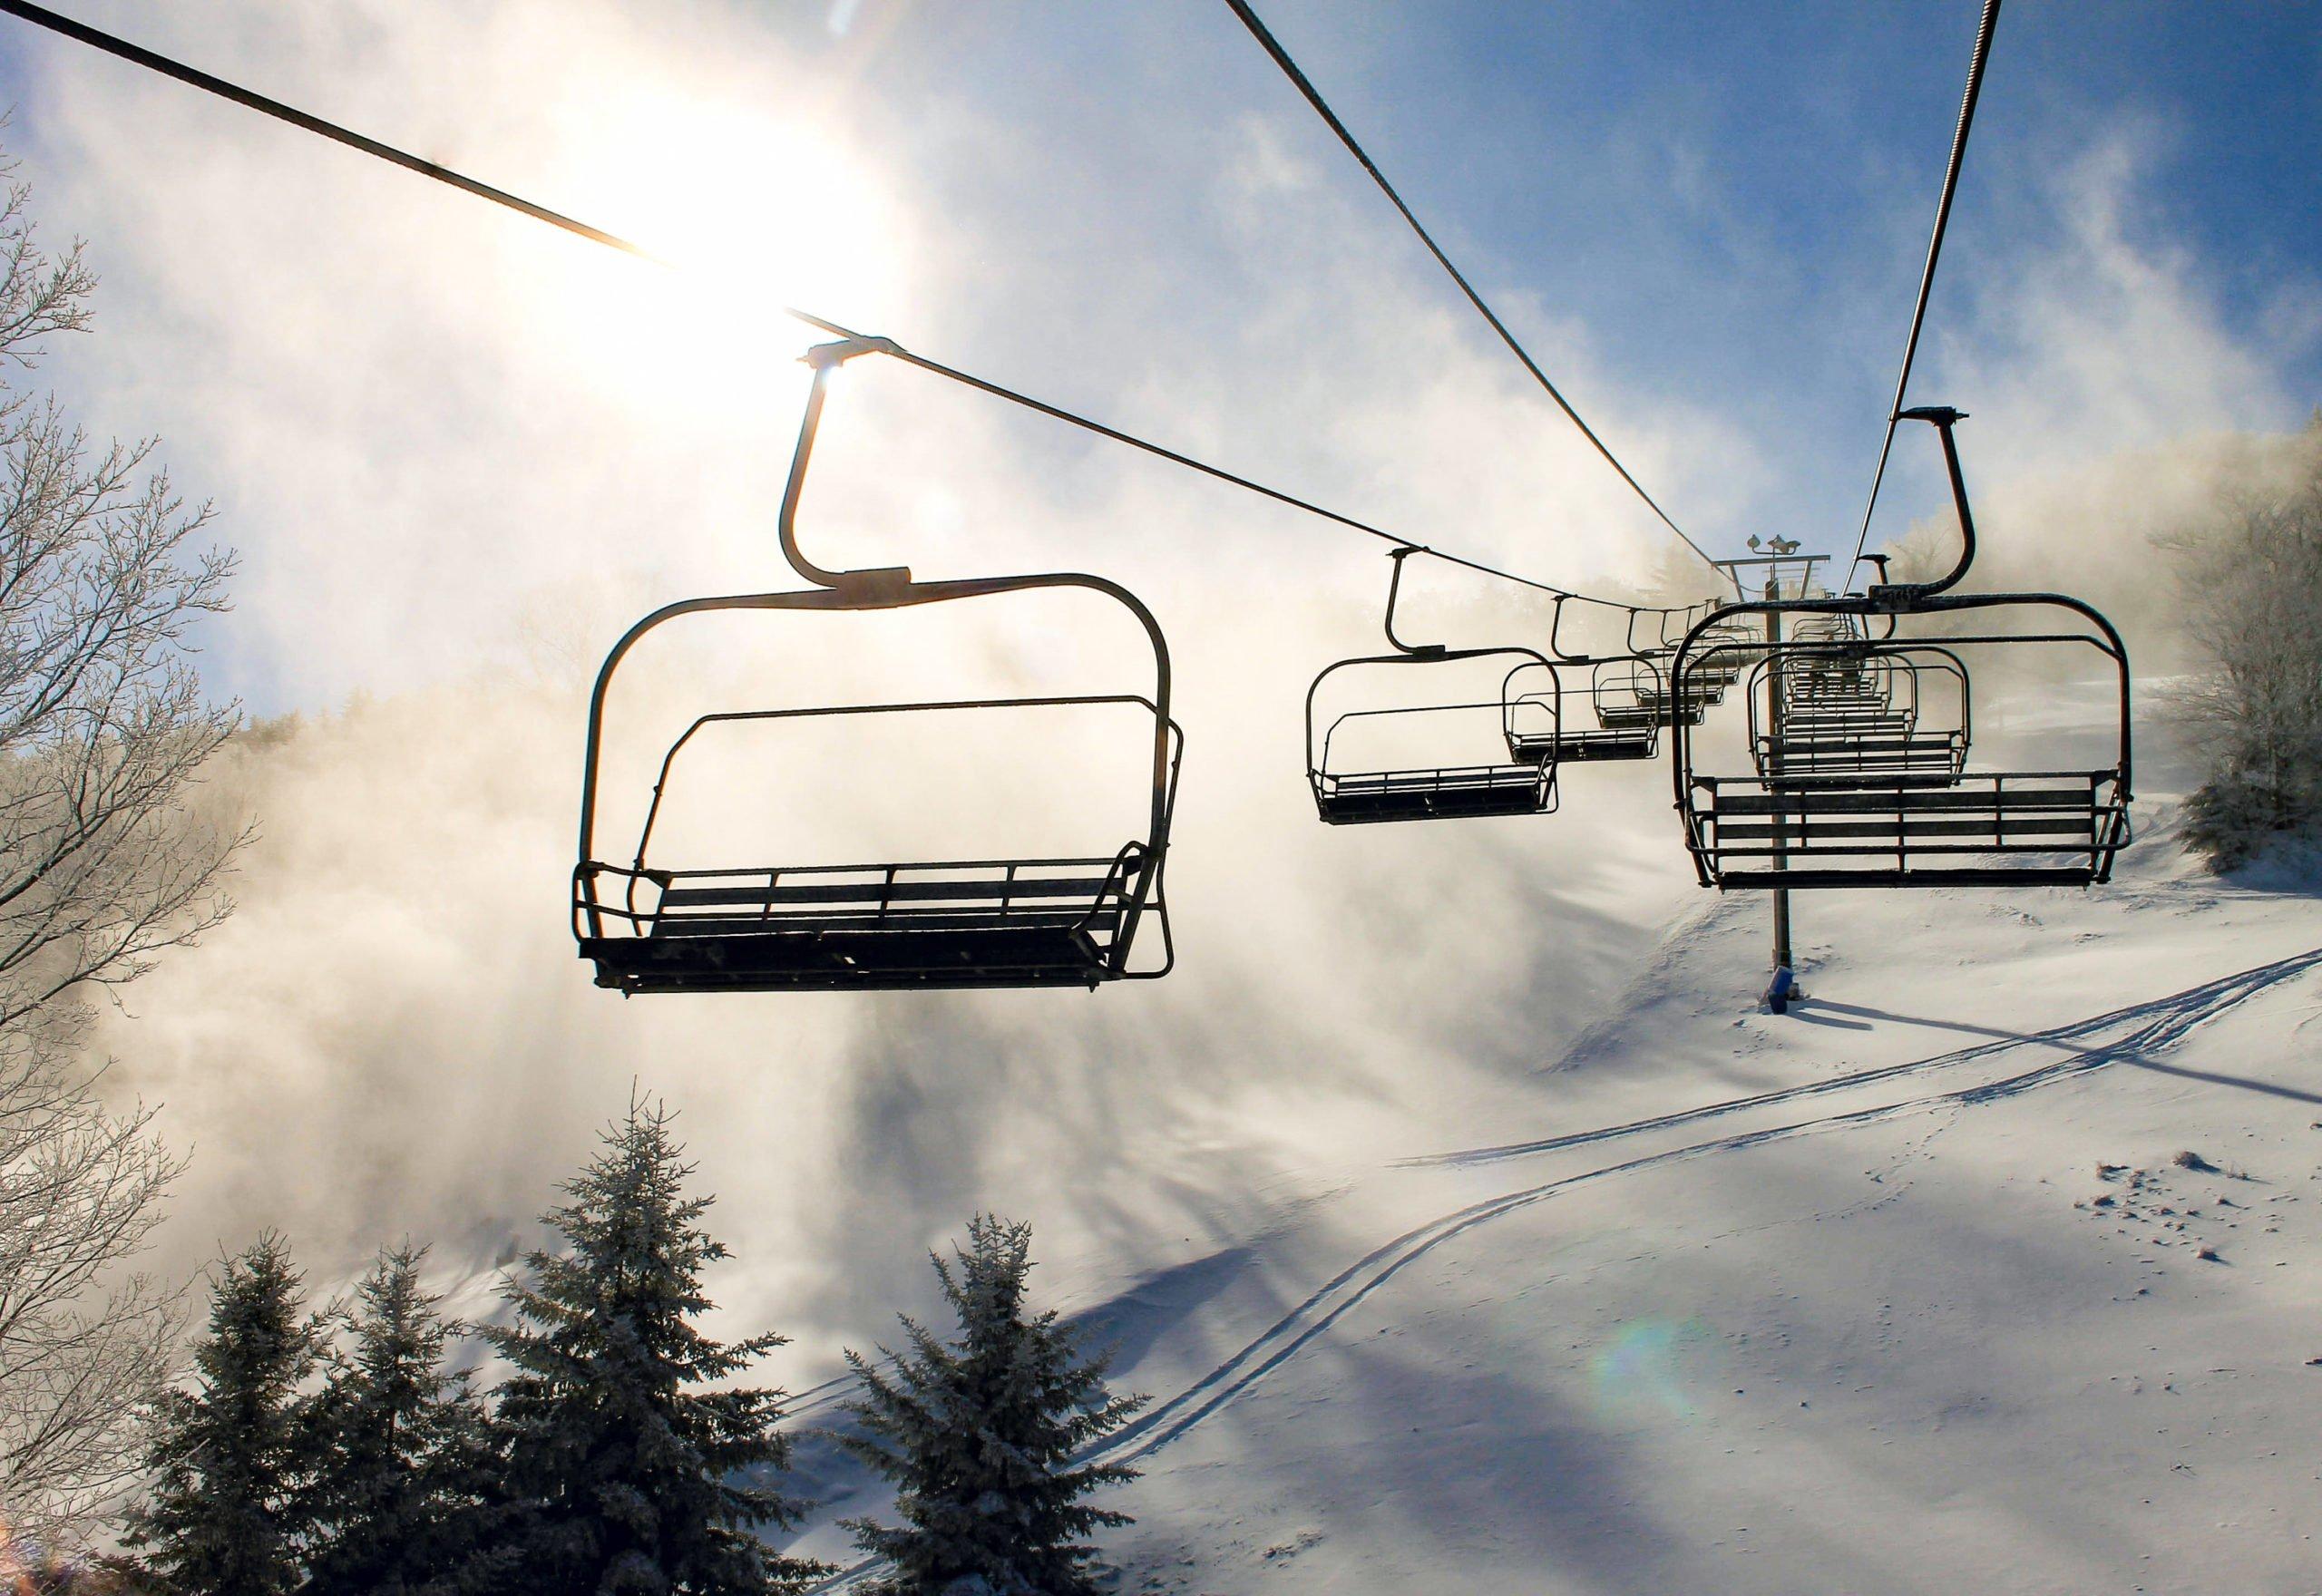 The 9 Best Ski Resorts Close to DC